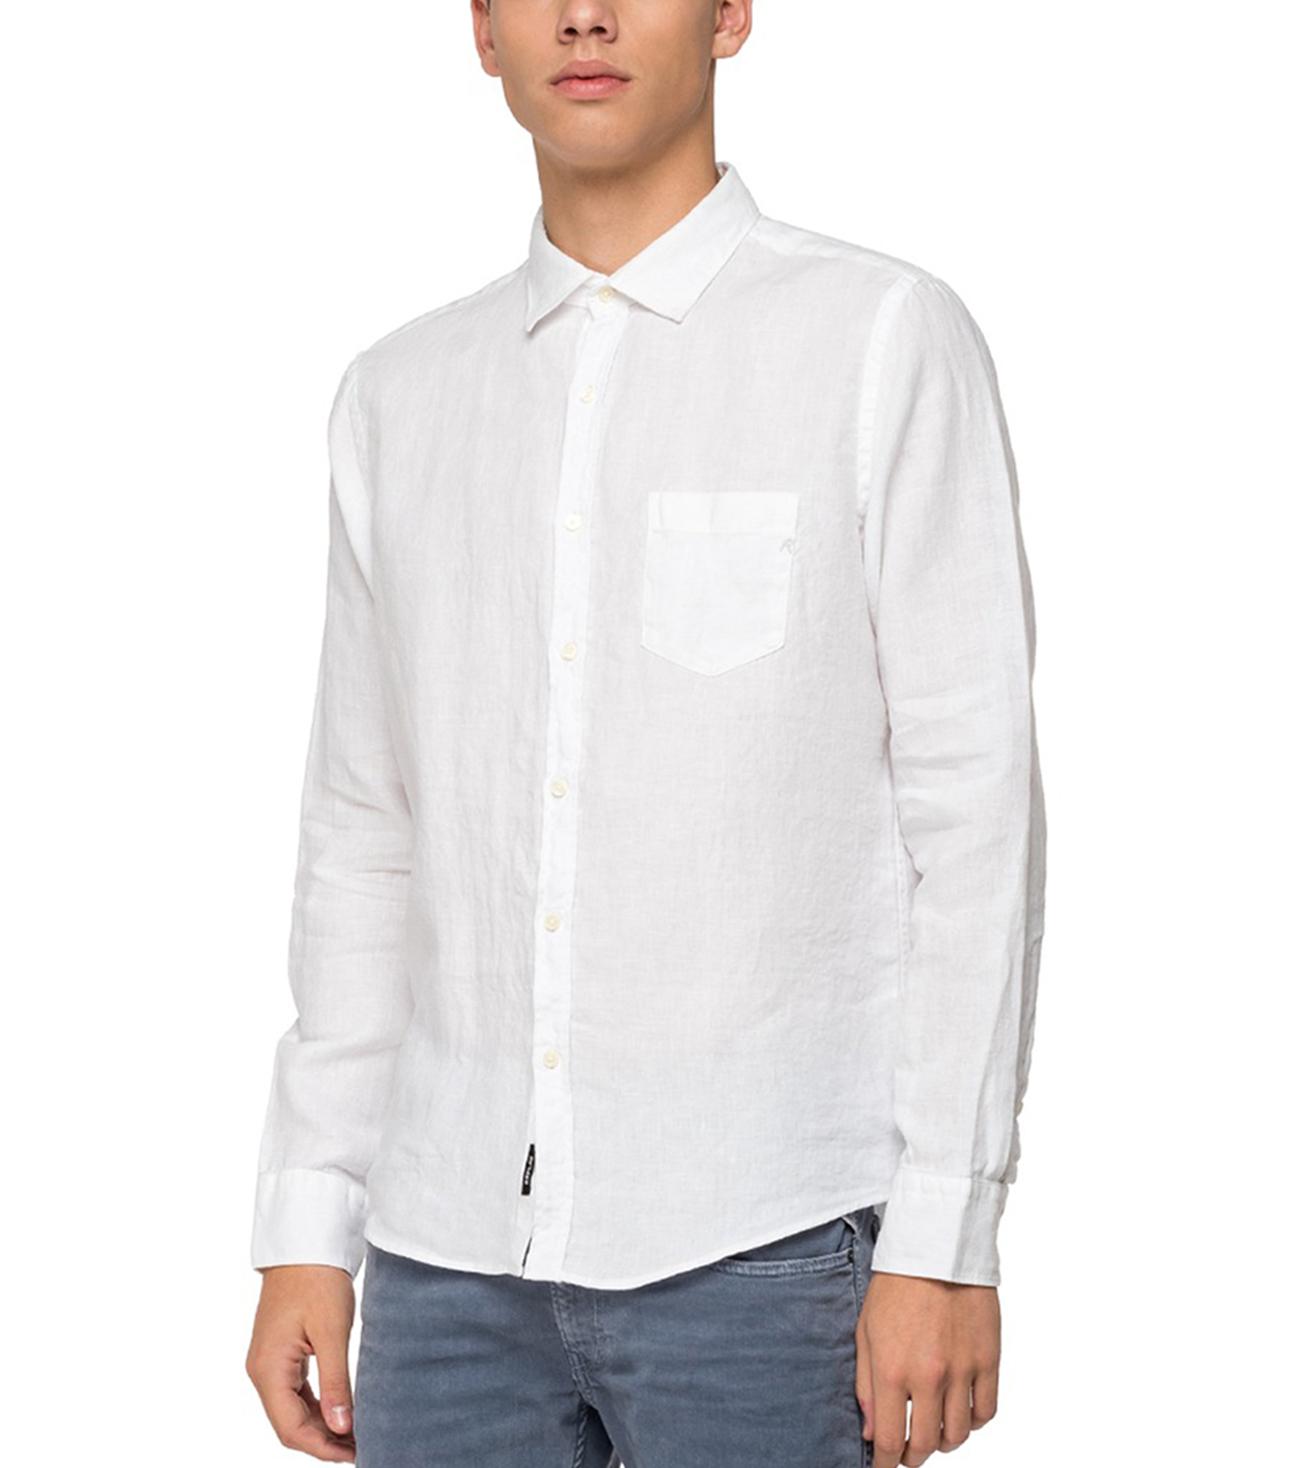 REPLAY | White garment dyed linen Shirt